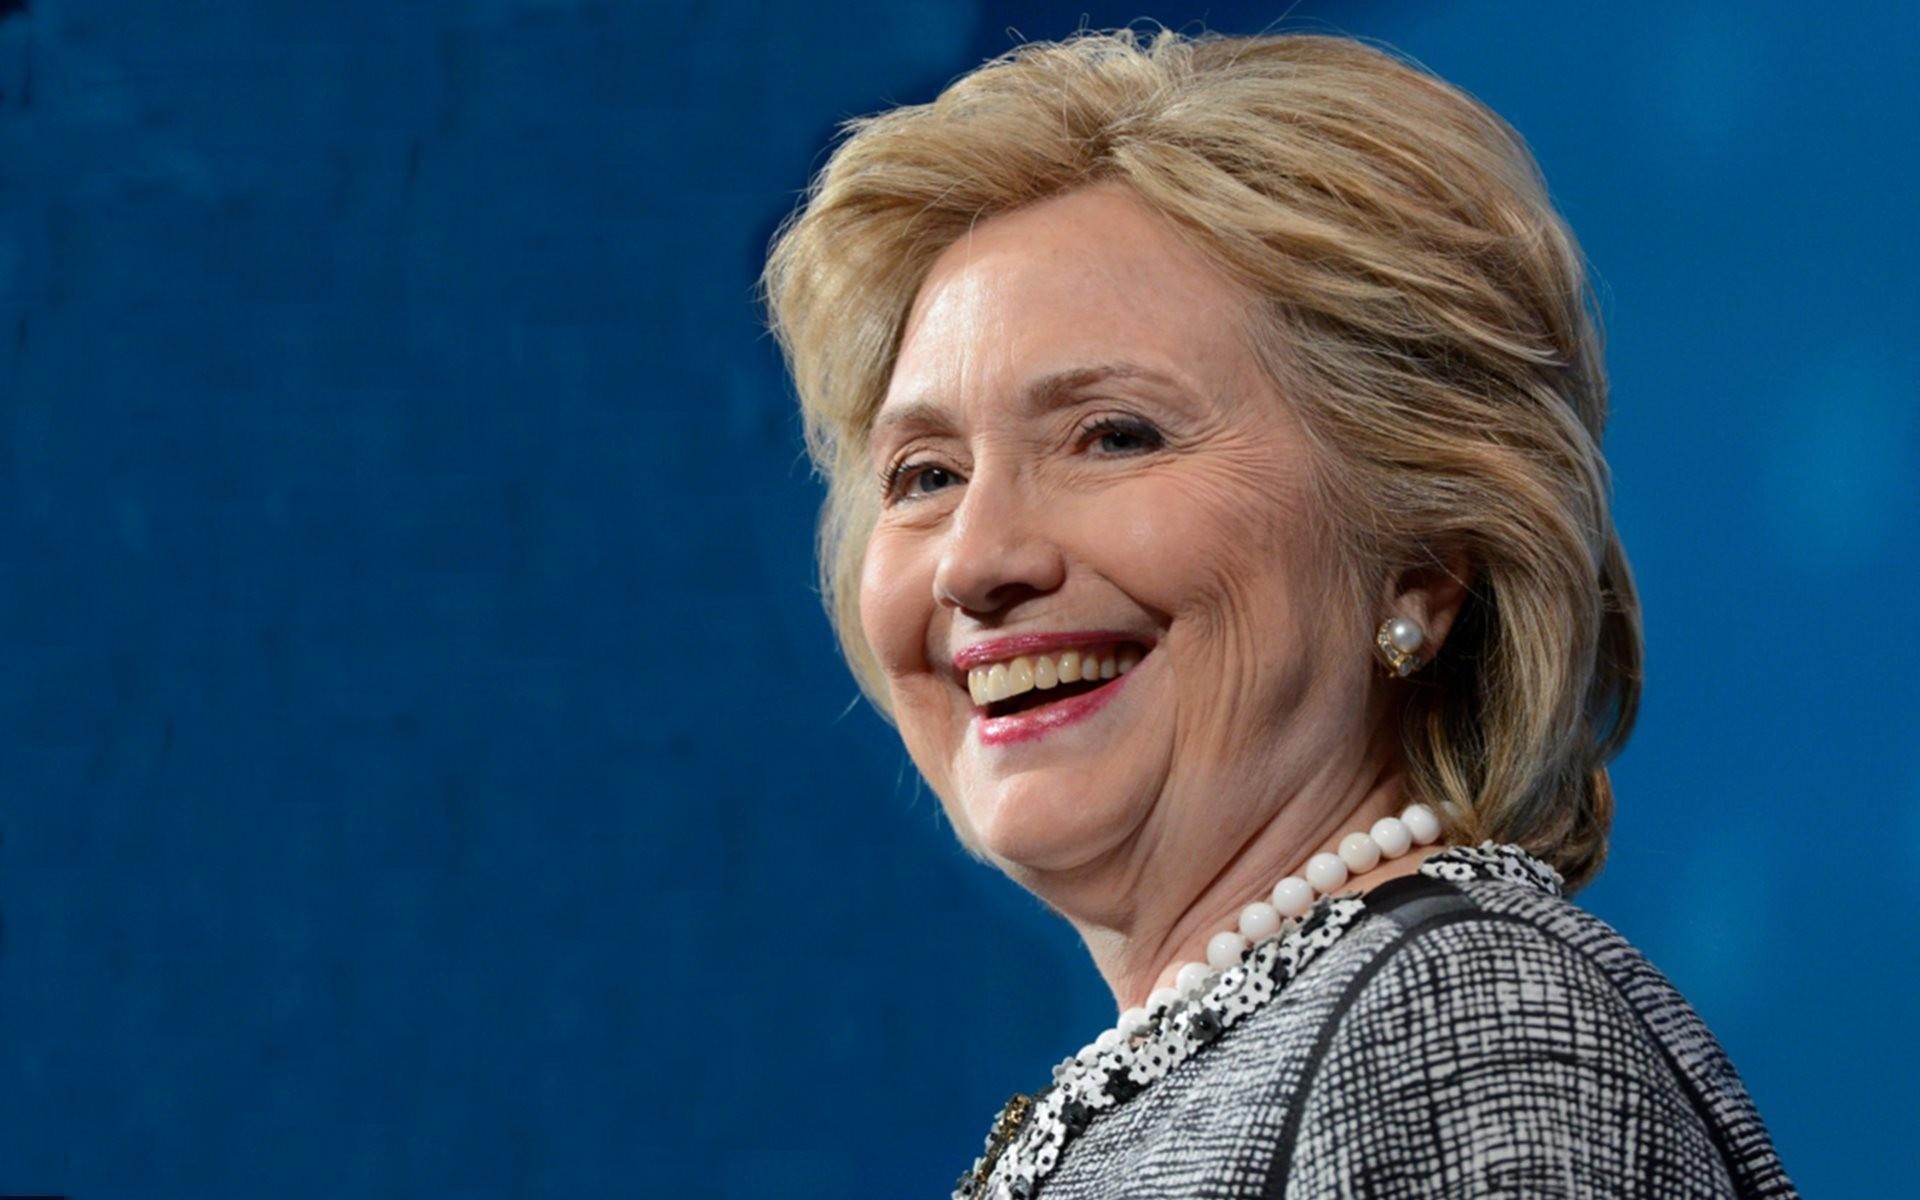 Beautiful Hillary Clinton Wallpapers in HD5WP